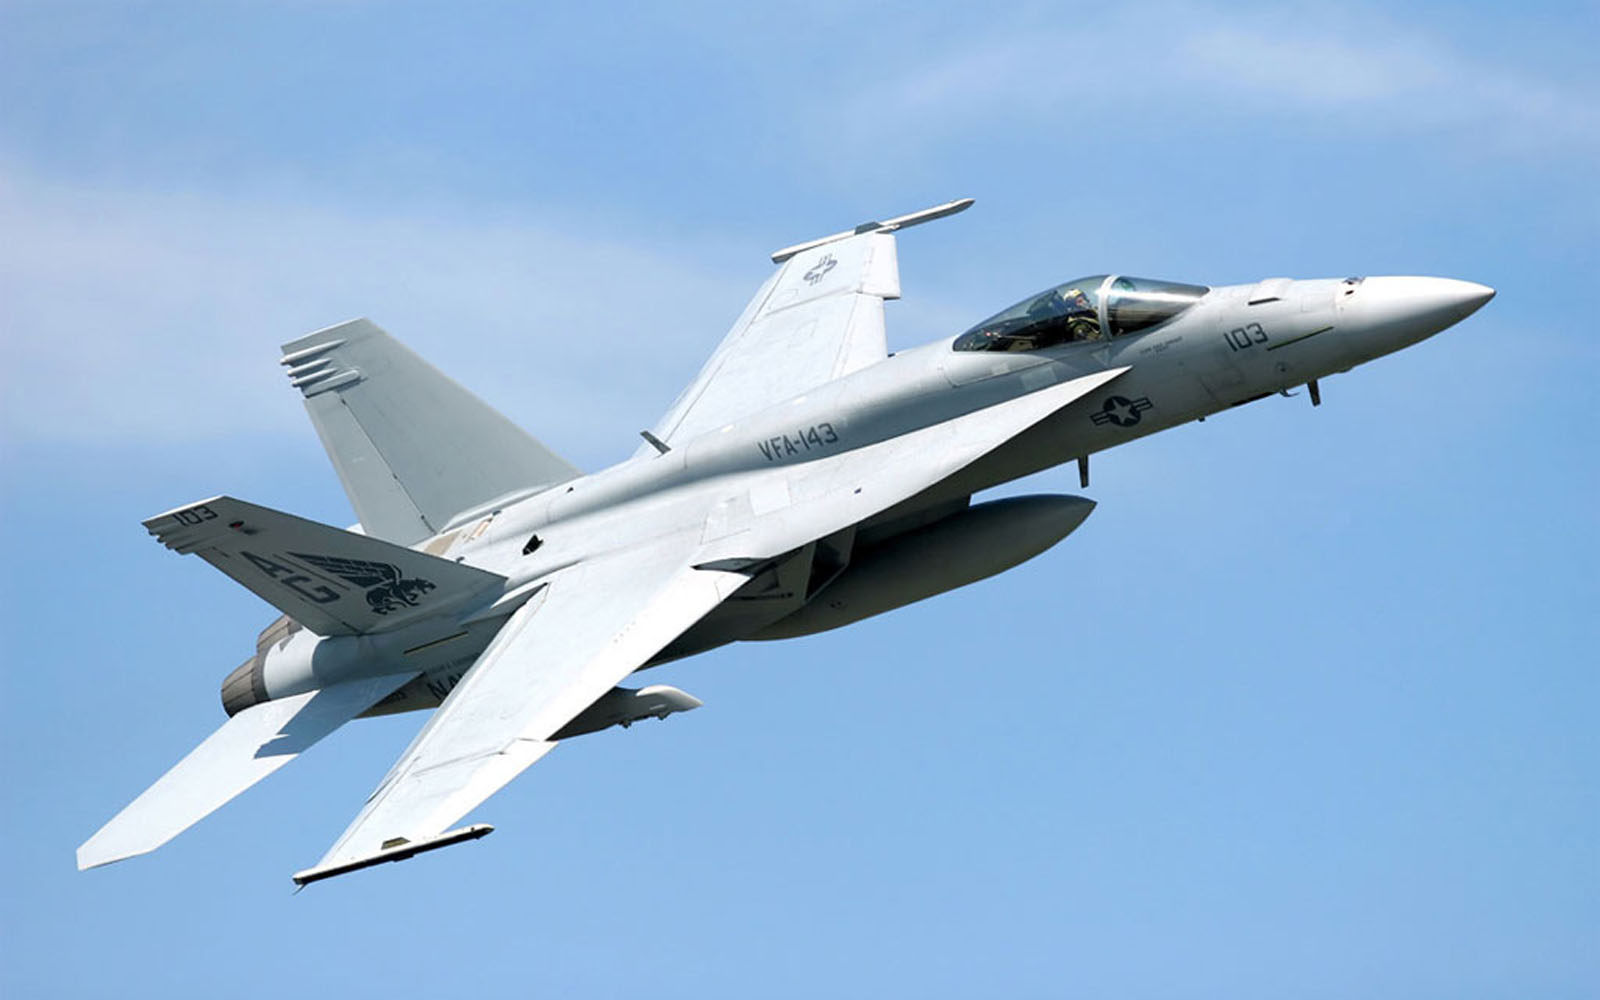 wallpapers: F A-18F Super Hornet Aircraft Wallpapers